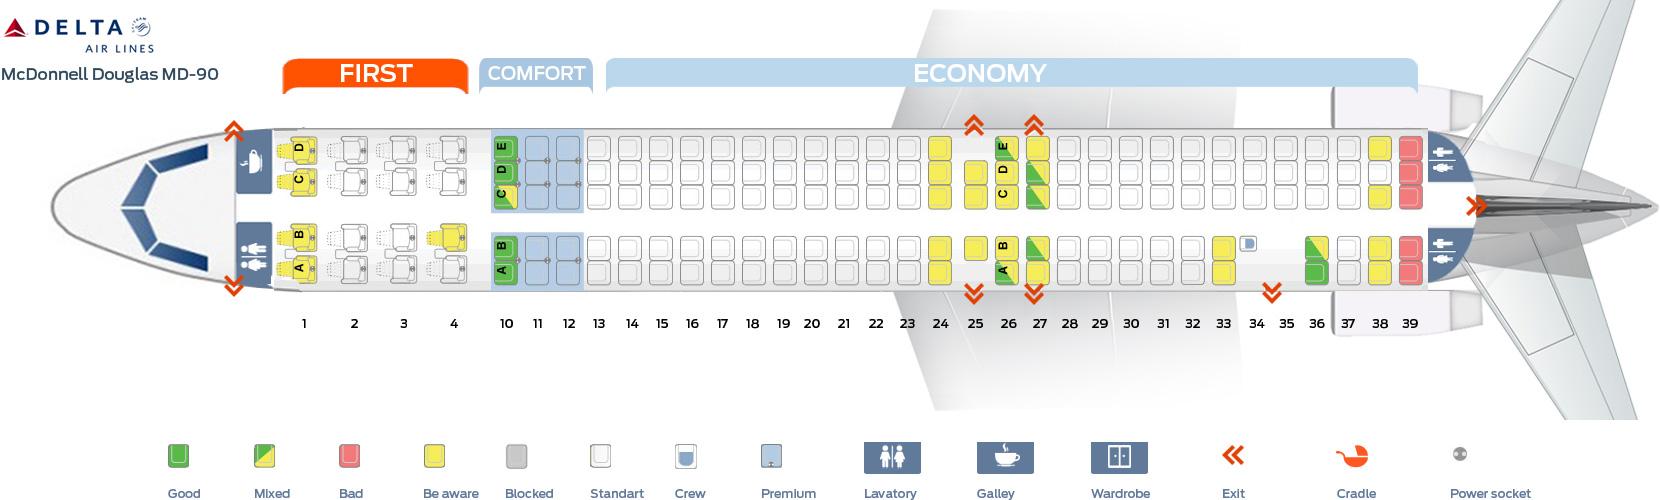 Delta Douglas Md 80 Seating Chart Brokeasshome Com